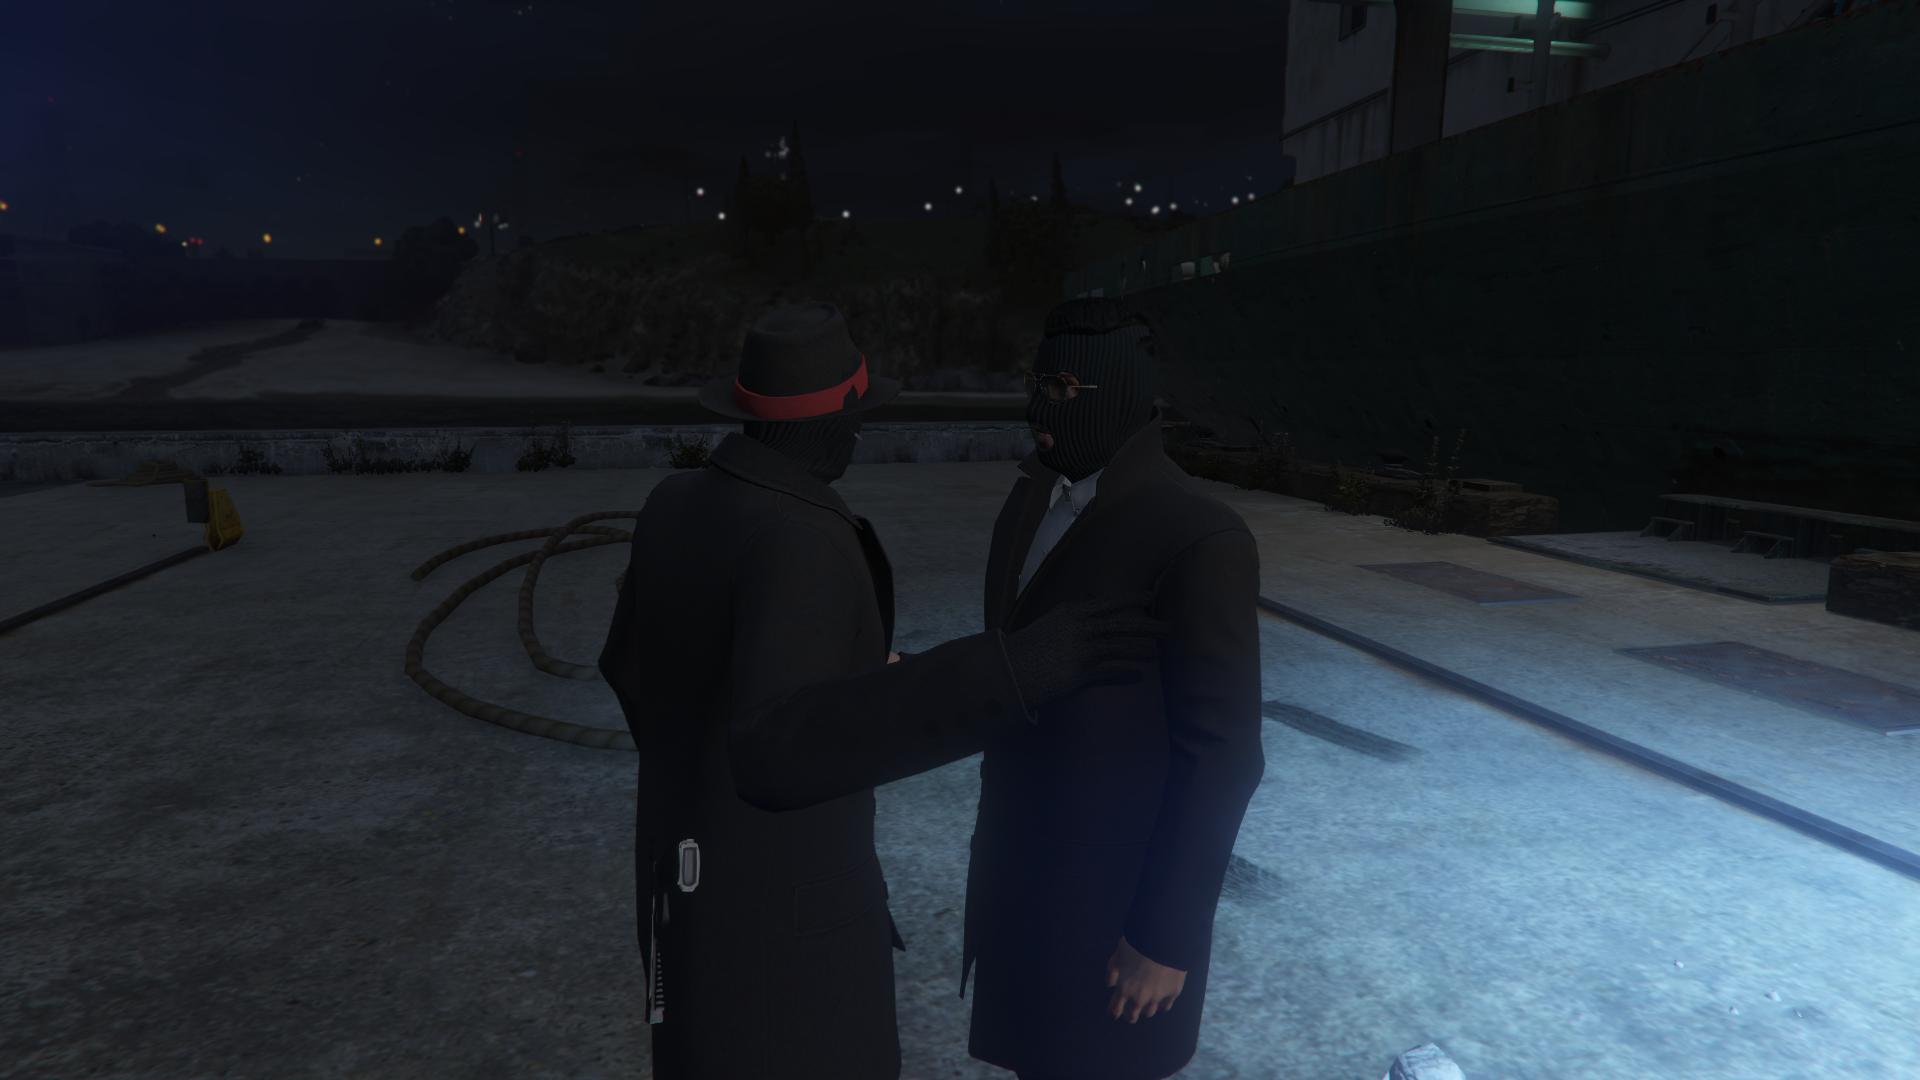 Grand-Theft-Auto-V-Screenshot-2021-01-04-12-09-05-79.png